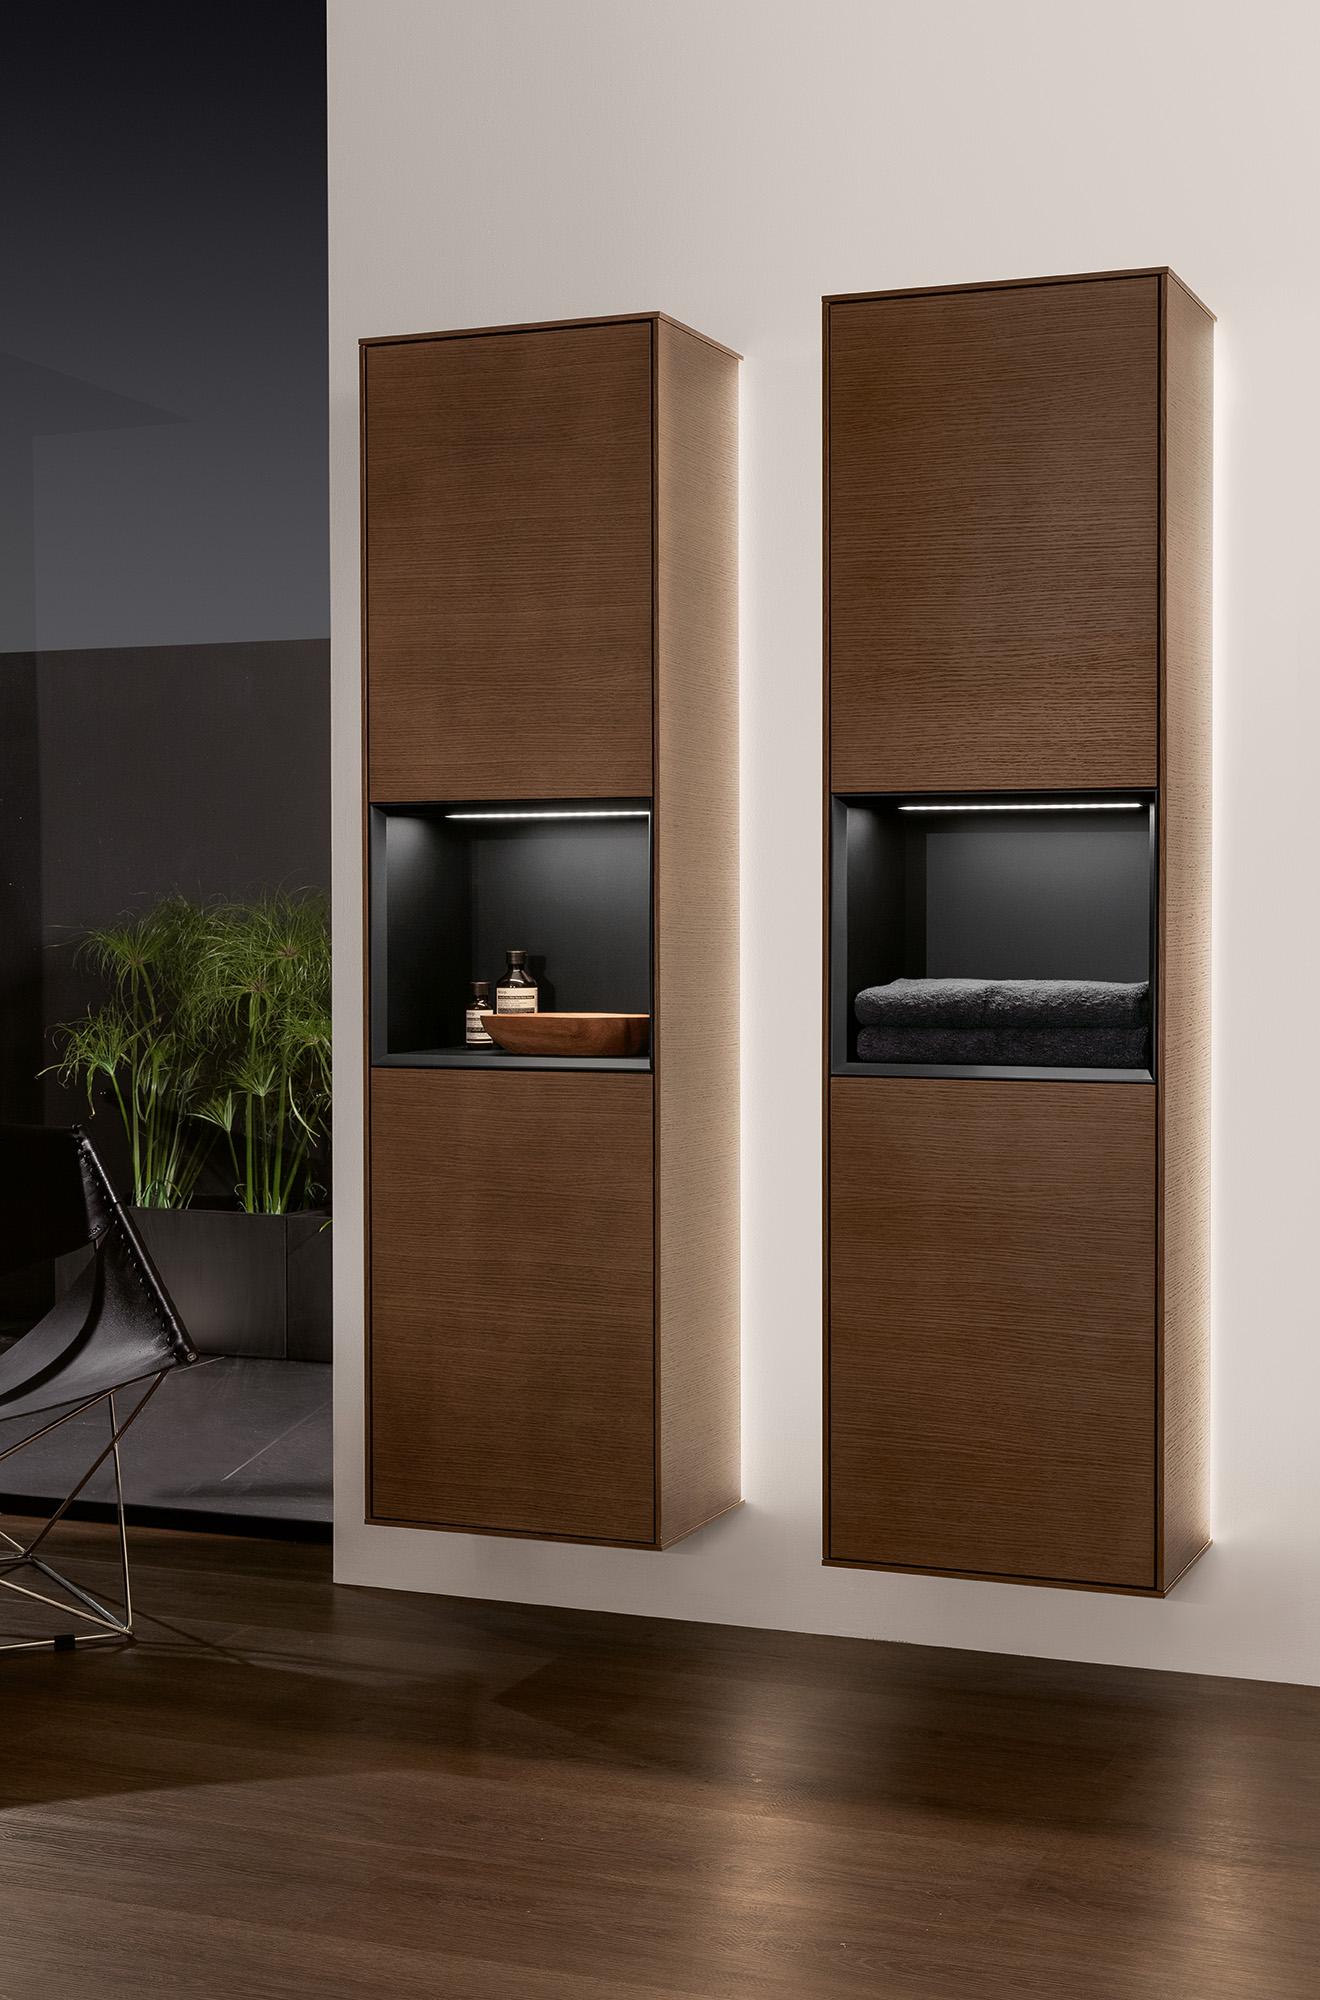 finion armoire haute angulaire g47 villeroy boch. Black Bedroom Furniture Sets. Home Design Ideas